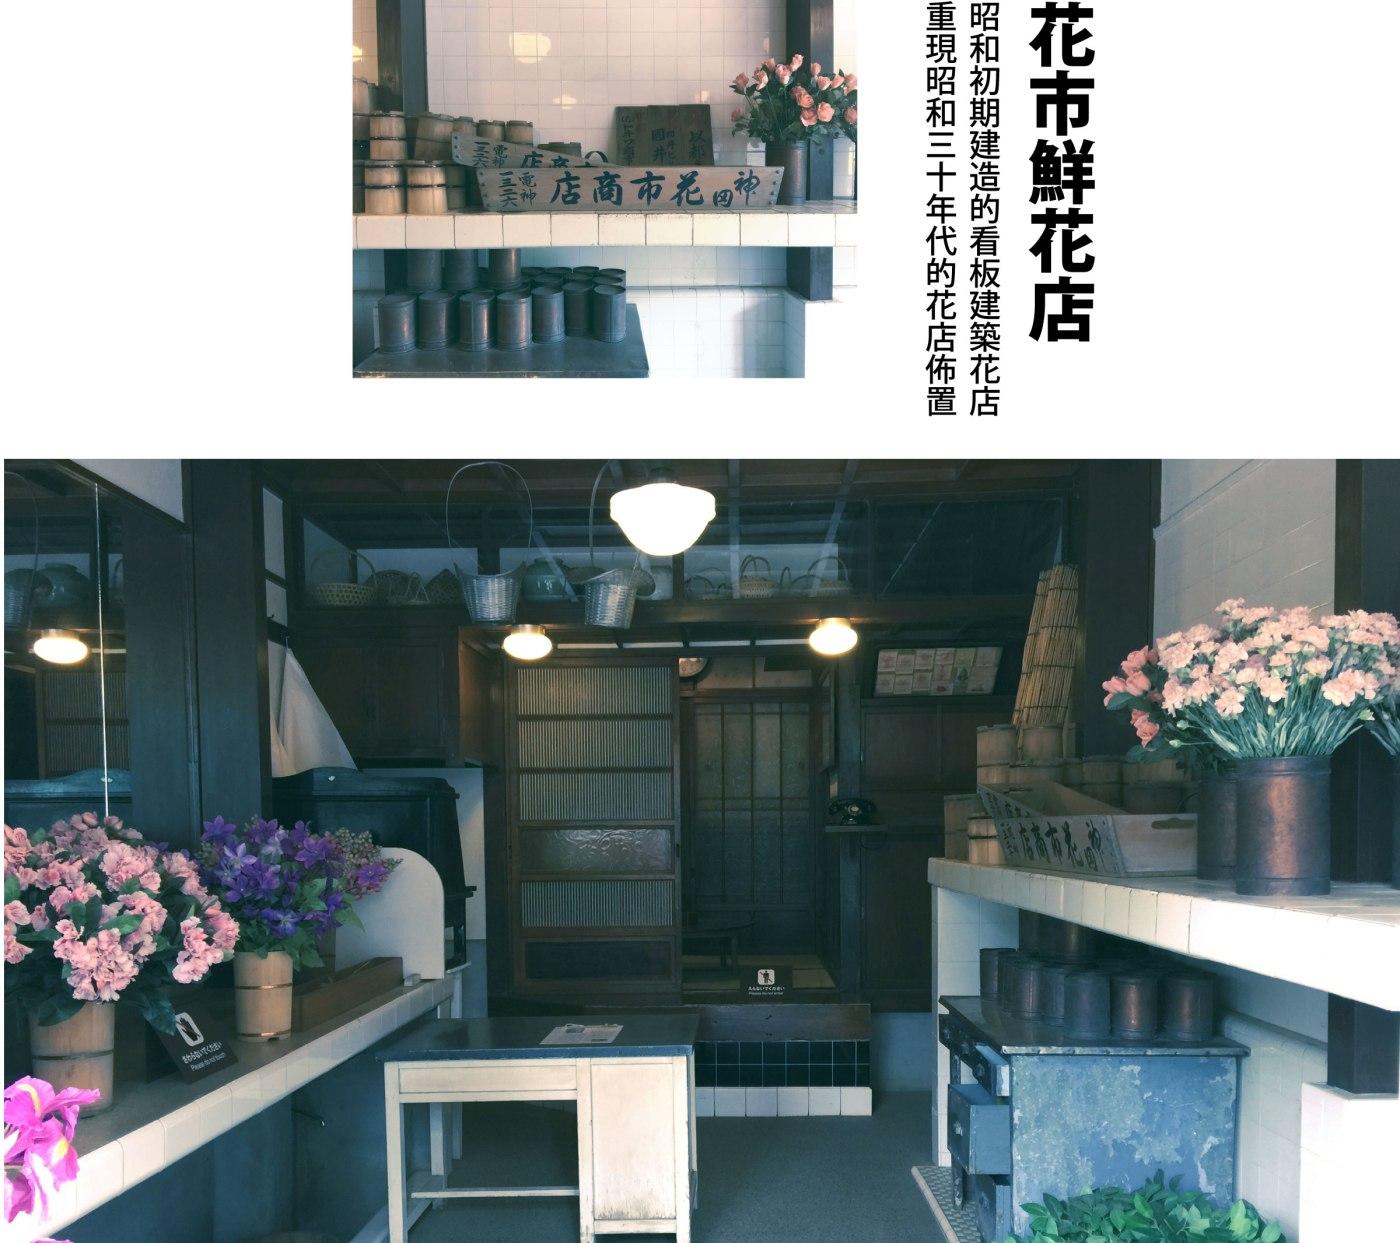 tokyo_topic-01-09